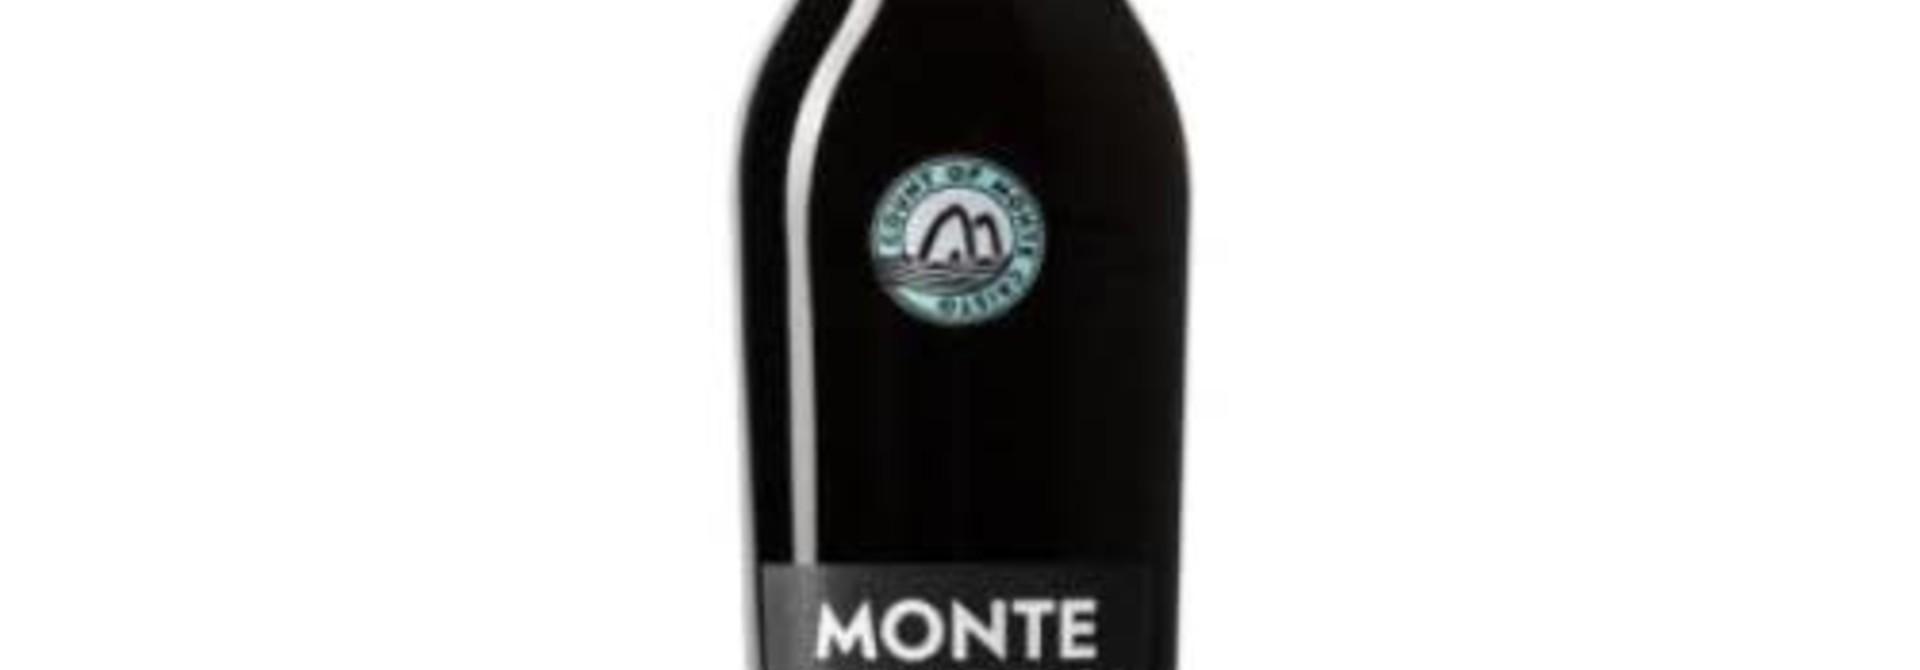 BOSTEELS - MONTE CRISTO 33CL